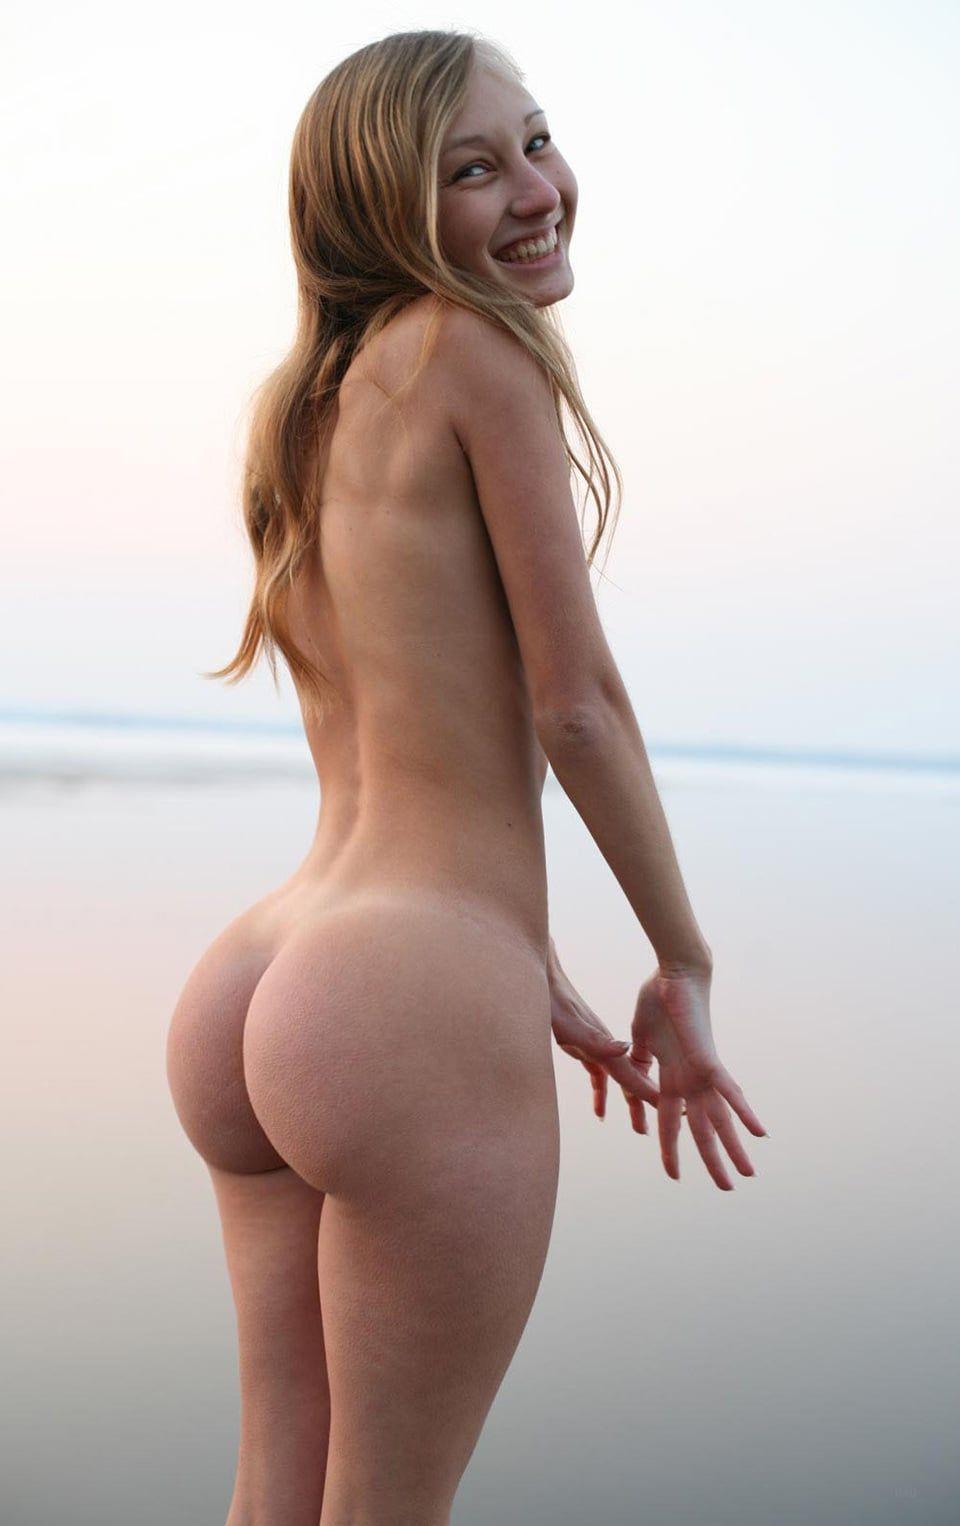 Butt nude girl Nice Perfect